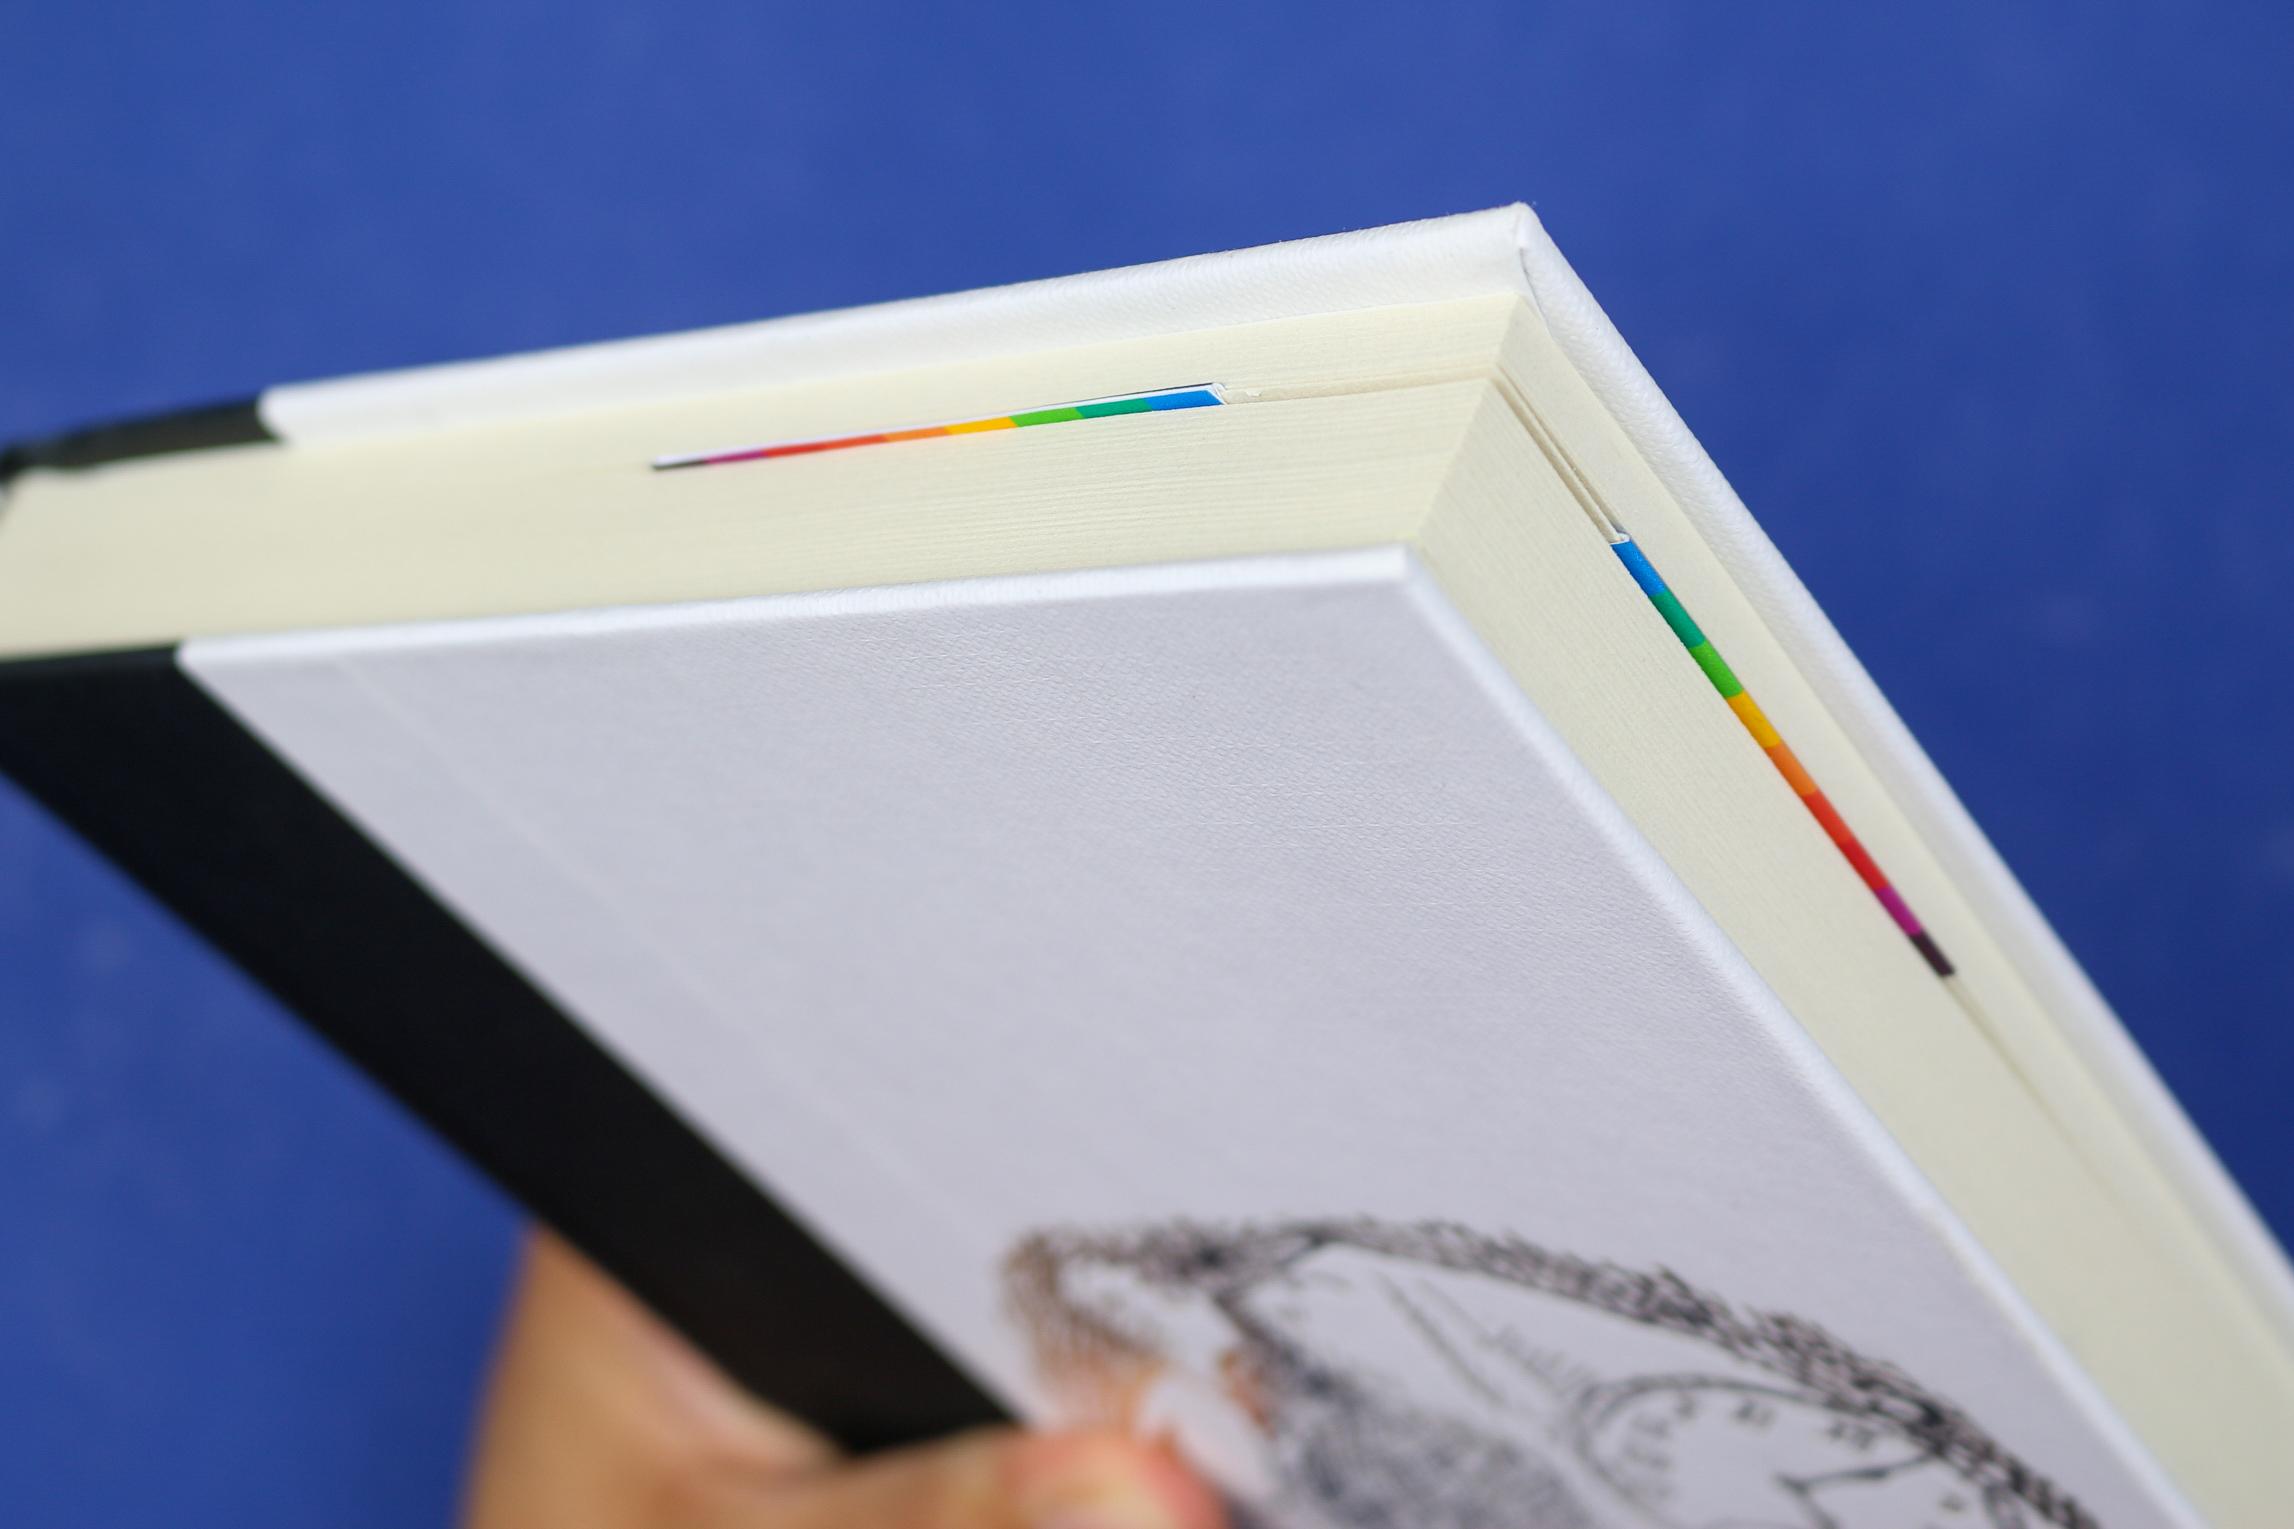 Rainbow Corner bookmark in a white book